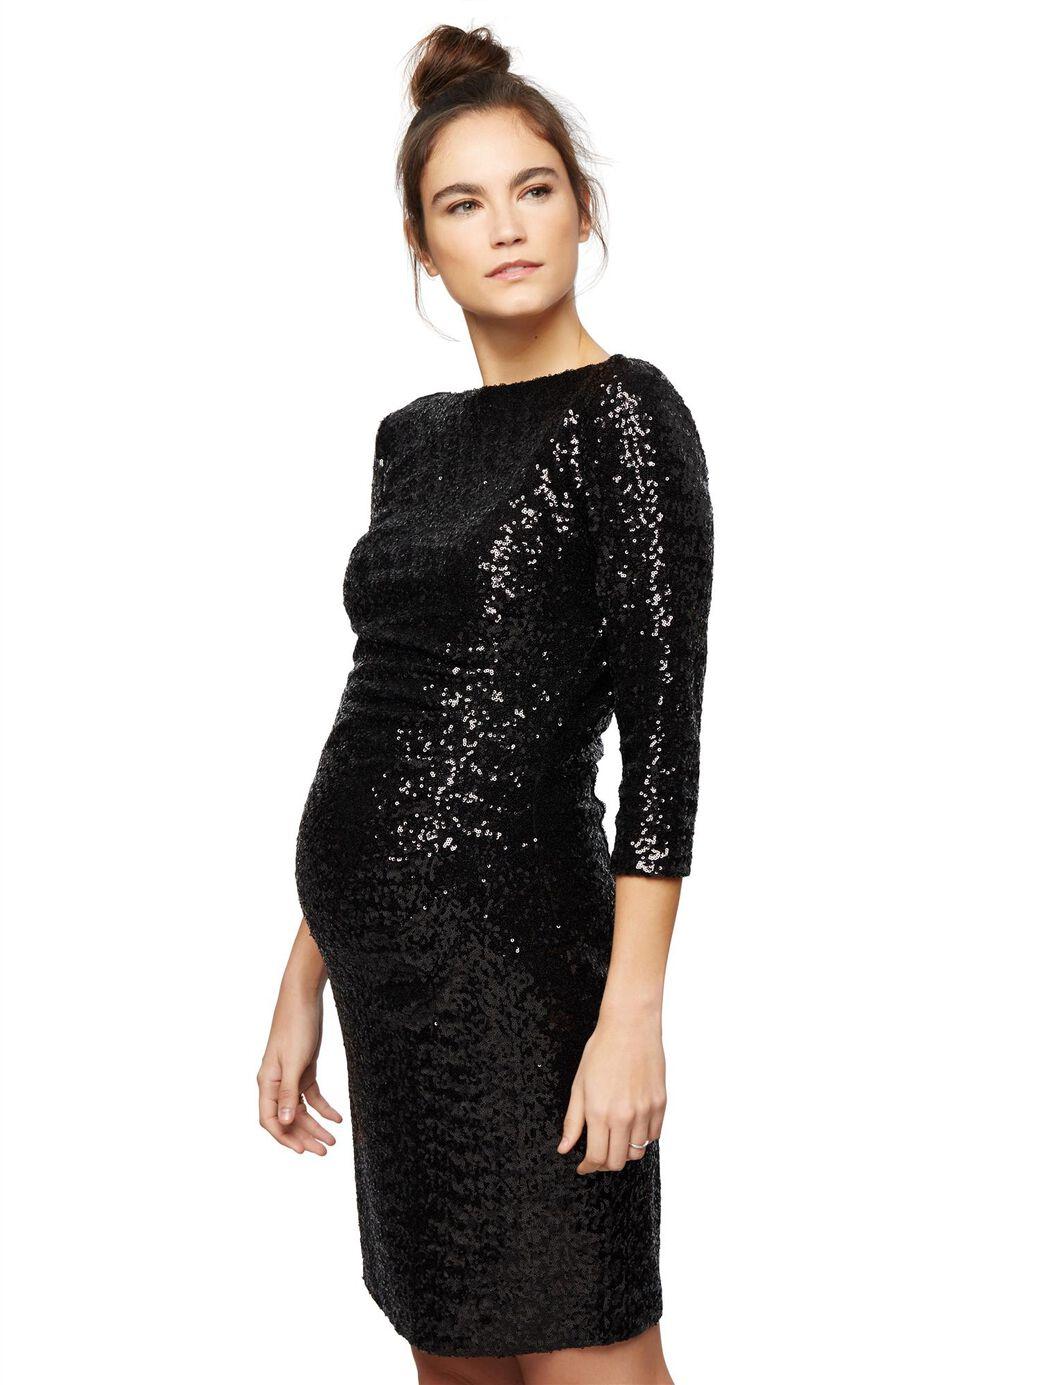 Js boutique sequin maternity dress destination maternity js boutique sequin maternity dress black ombrellifo Gallery